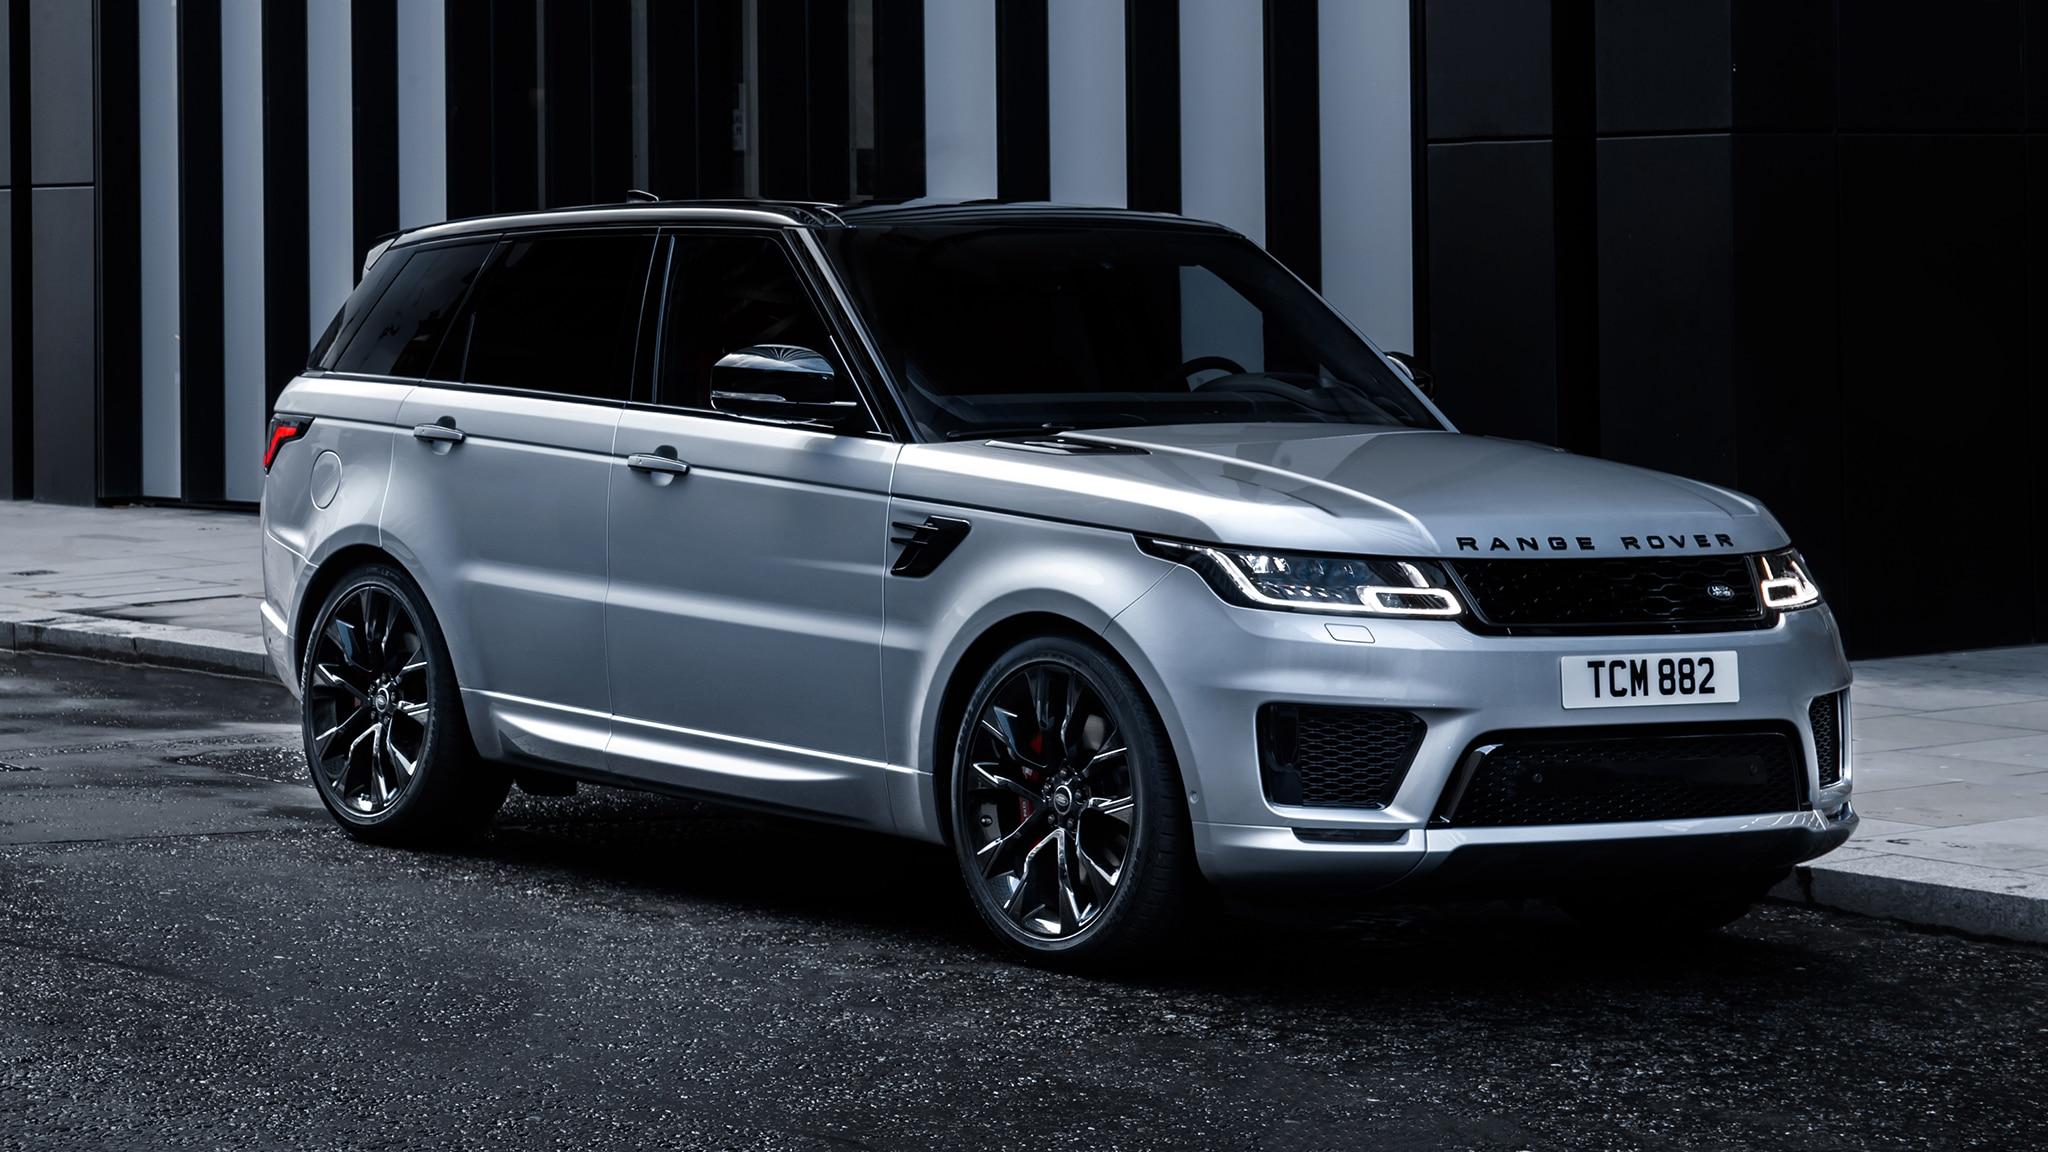 2020 Land Rover Range Rover: Changes, New Inline-6 Engine, Price >> 2020 Land Rover Range Rover Changes New Inline 6 Engine Price